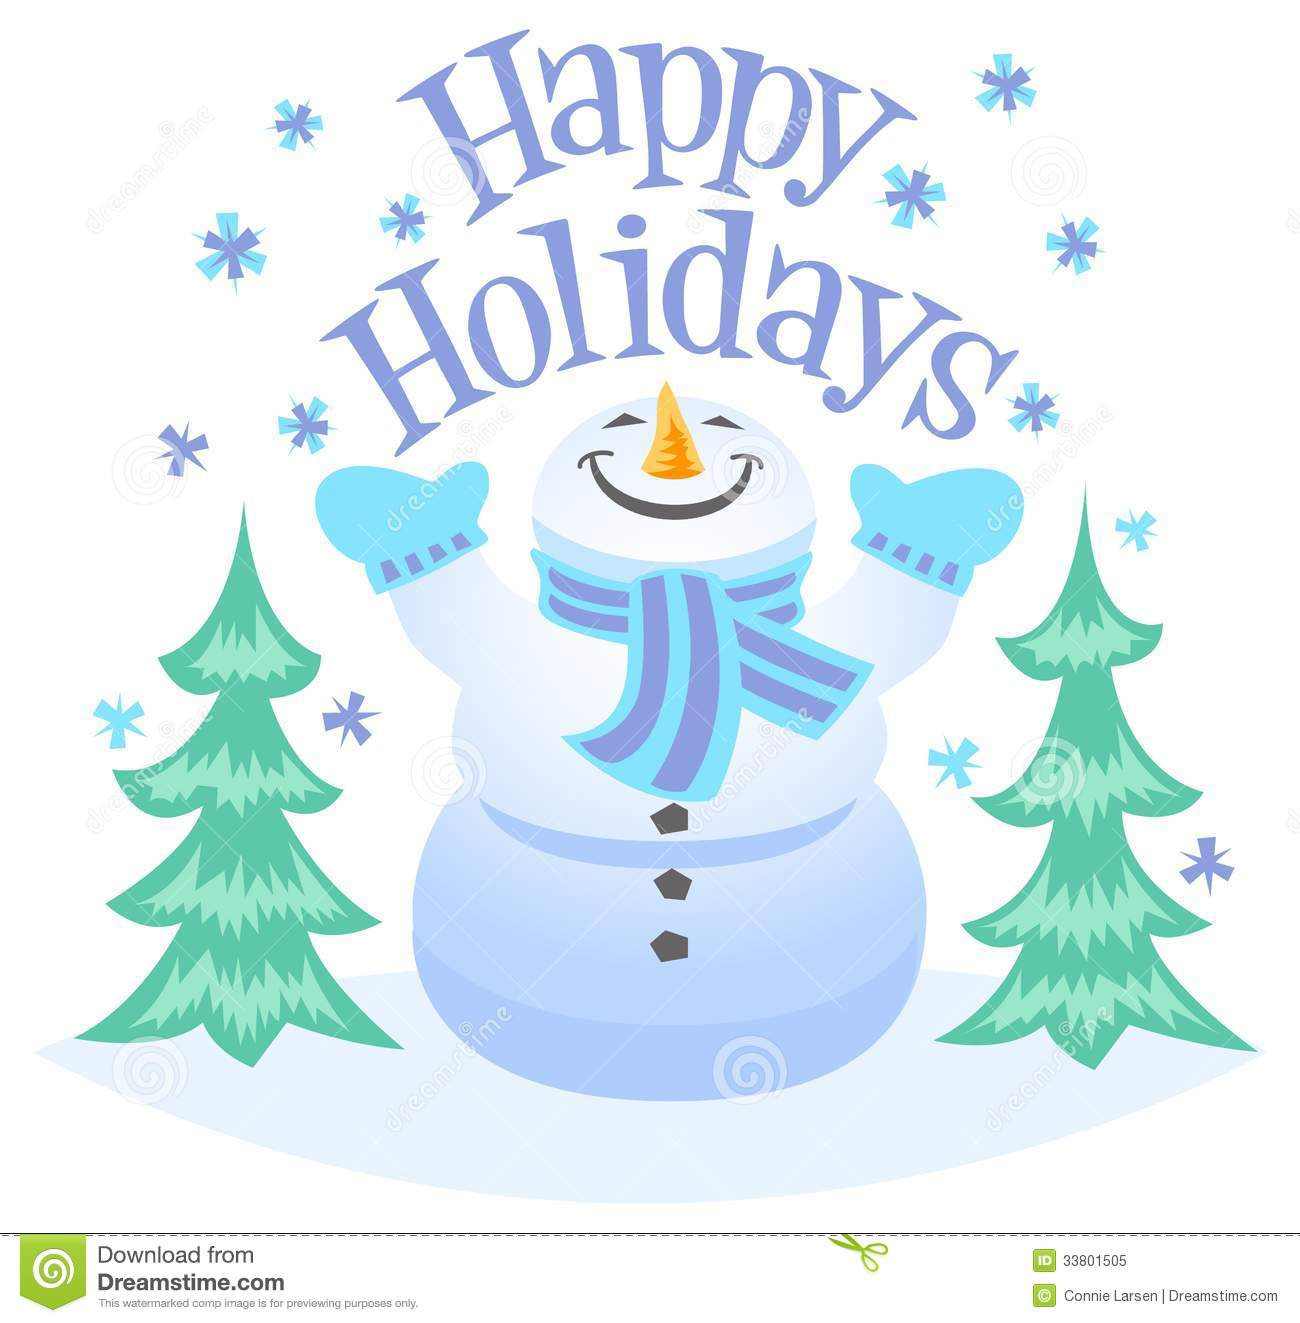 Happy Holidays Snowman Clipart .-Happy Holidays Snowman Clipart .-13